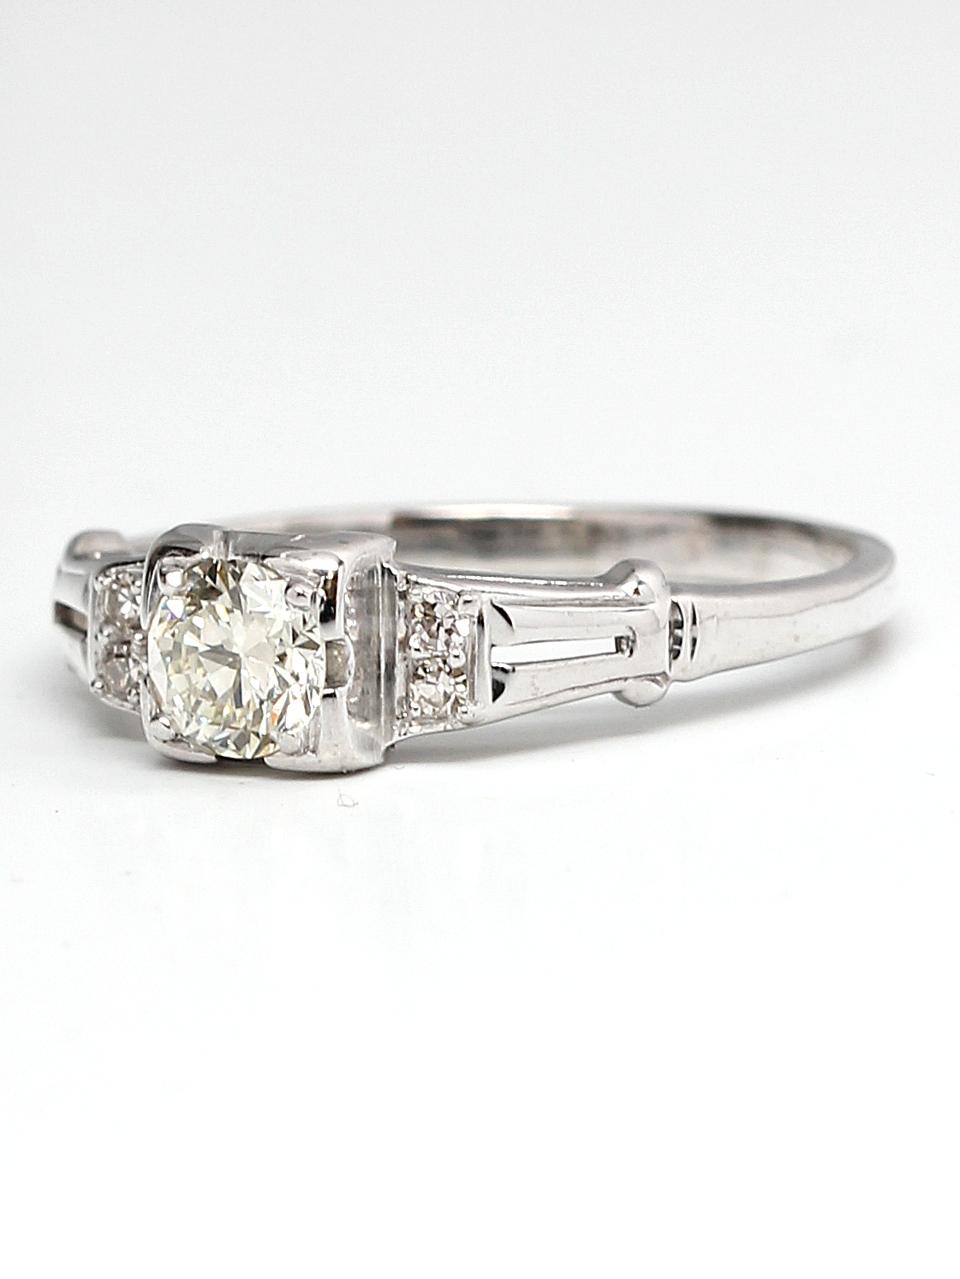 Vintage Engagement Ring 18KW 0.35ct OEC G-VS2 circa 1930s